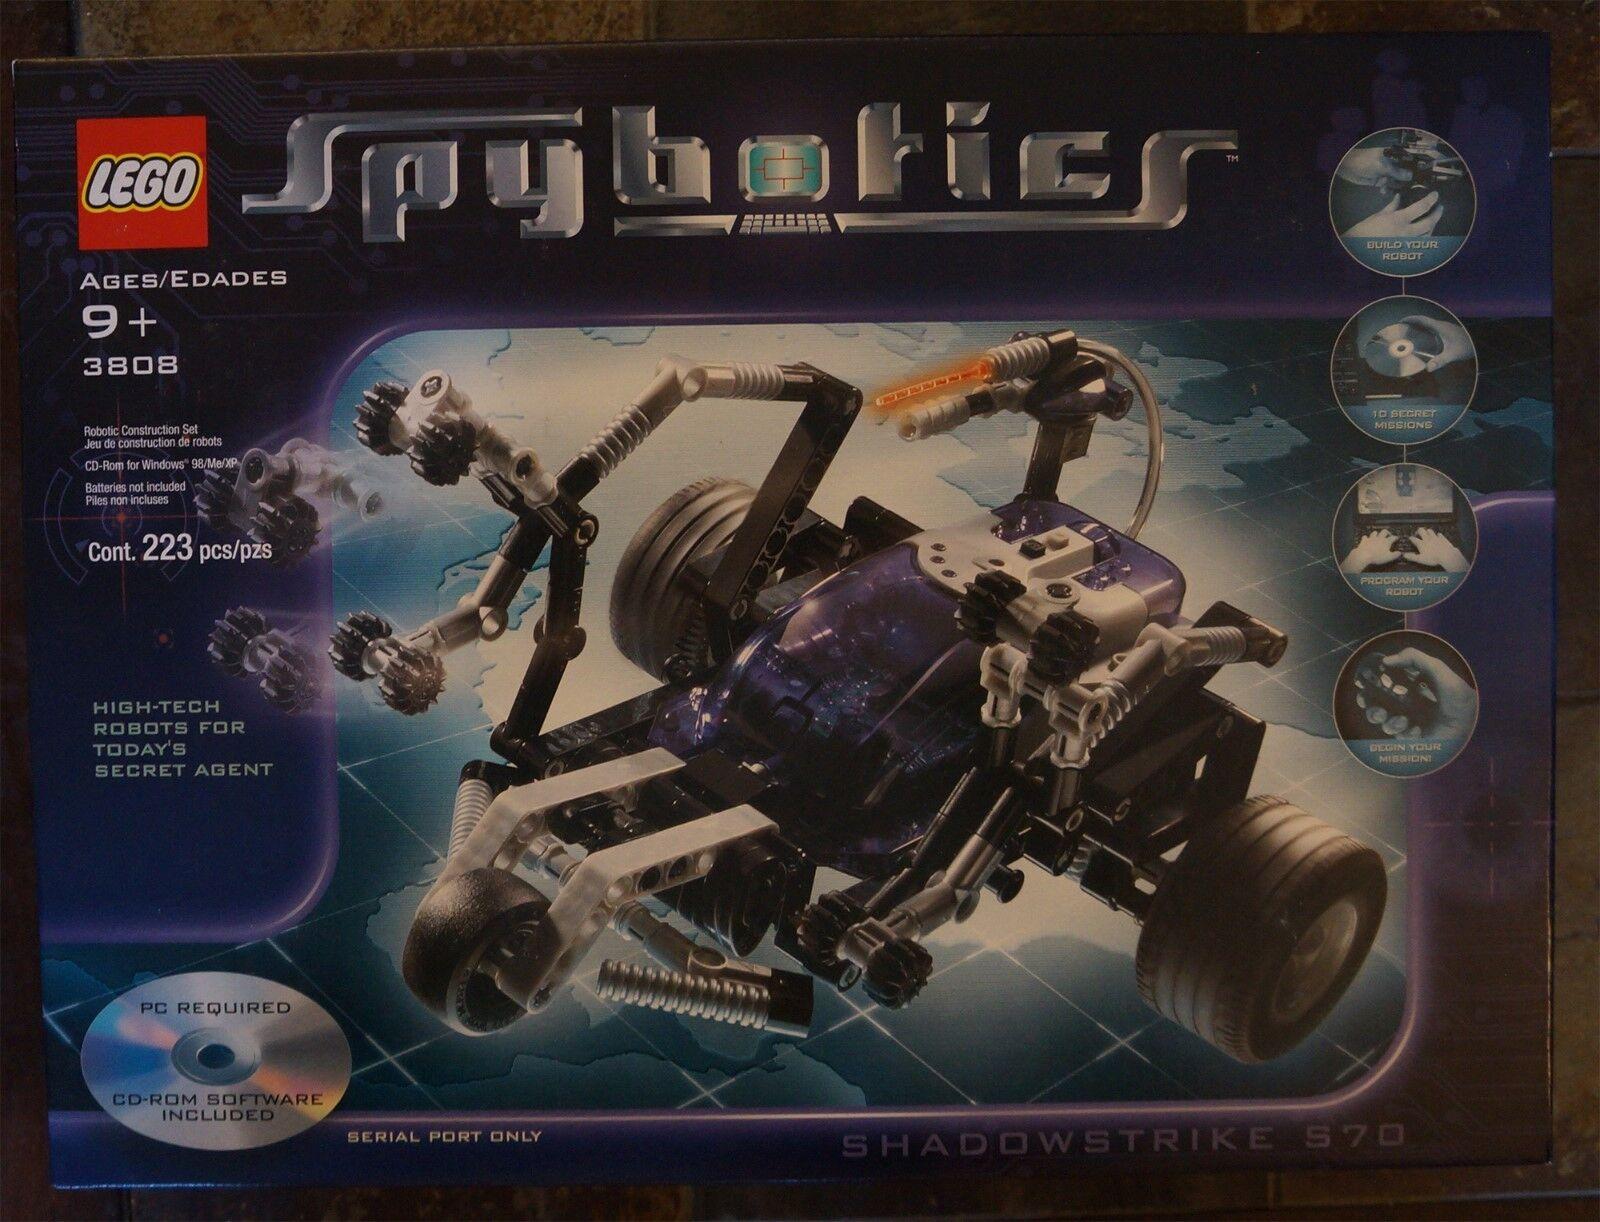 Lego Spybotics Shadowstrike S70 (3808) NEW